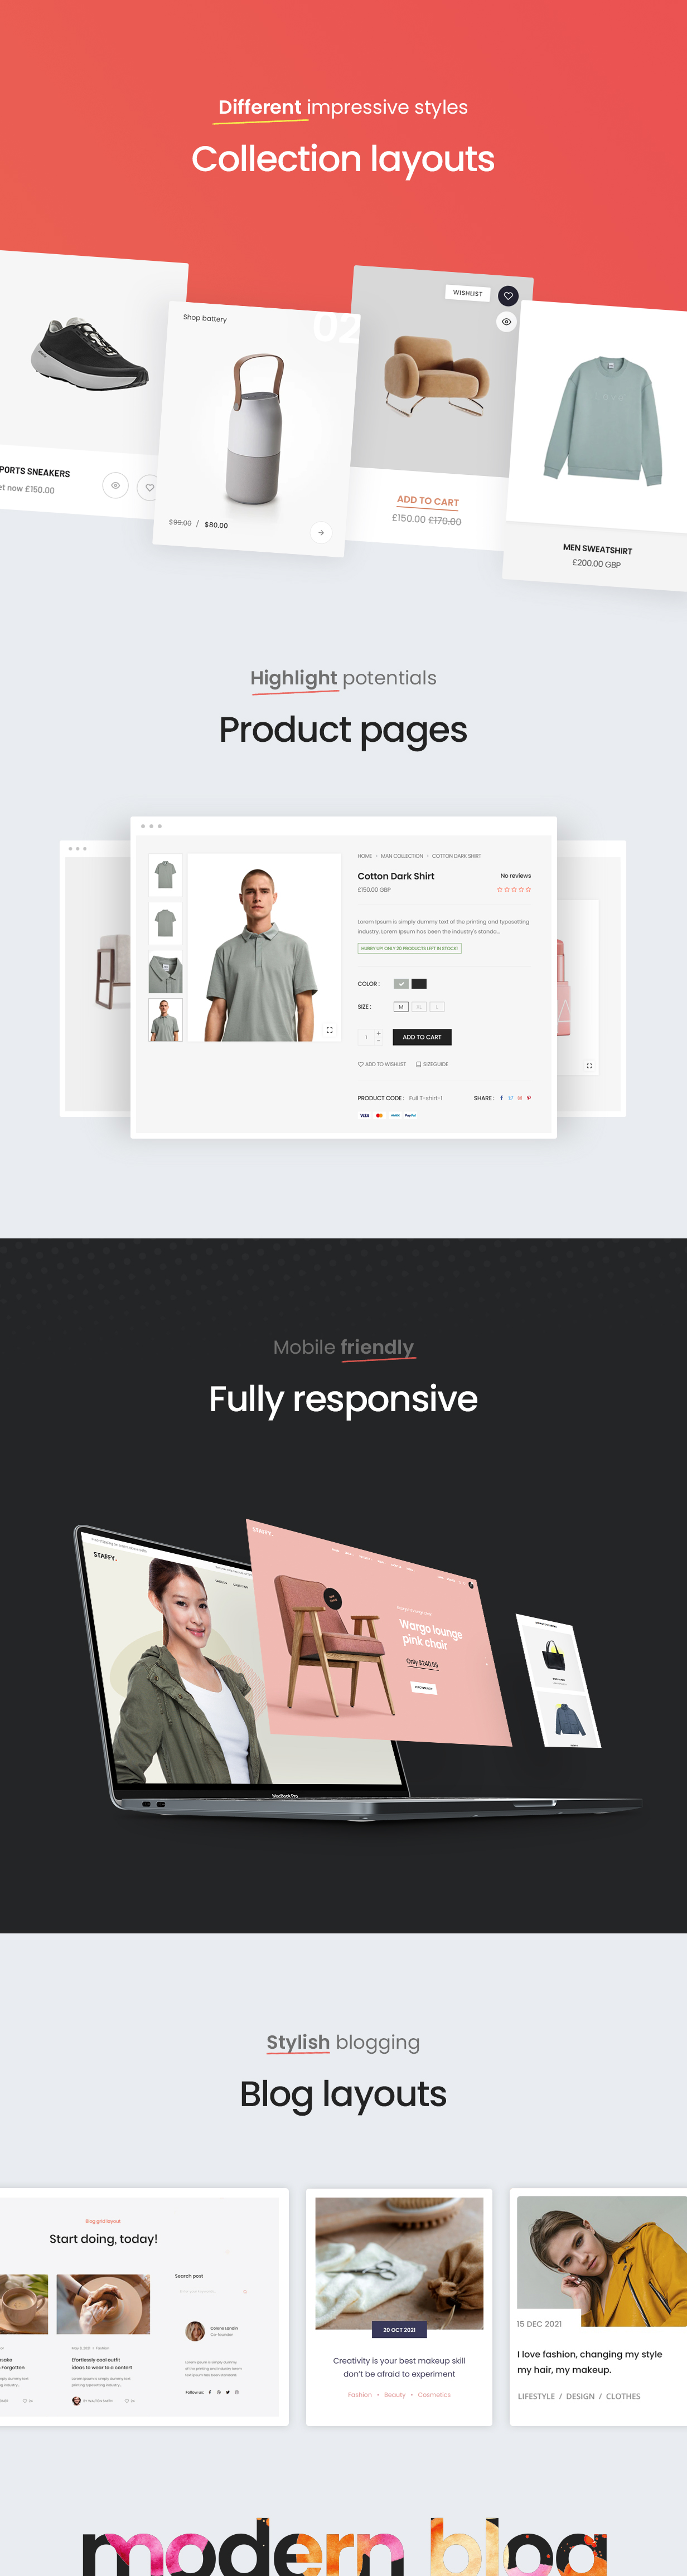 Staffy – The Responsive Multipurpose Shopify eCommerce Theme, Gobase64